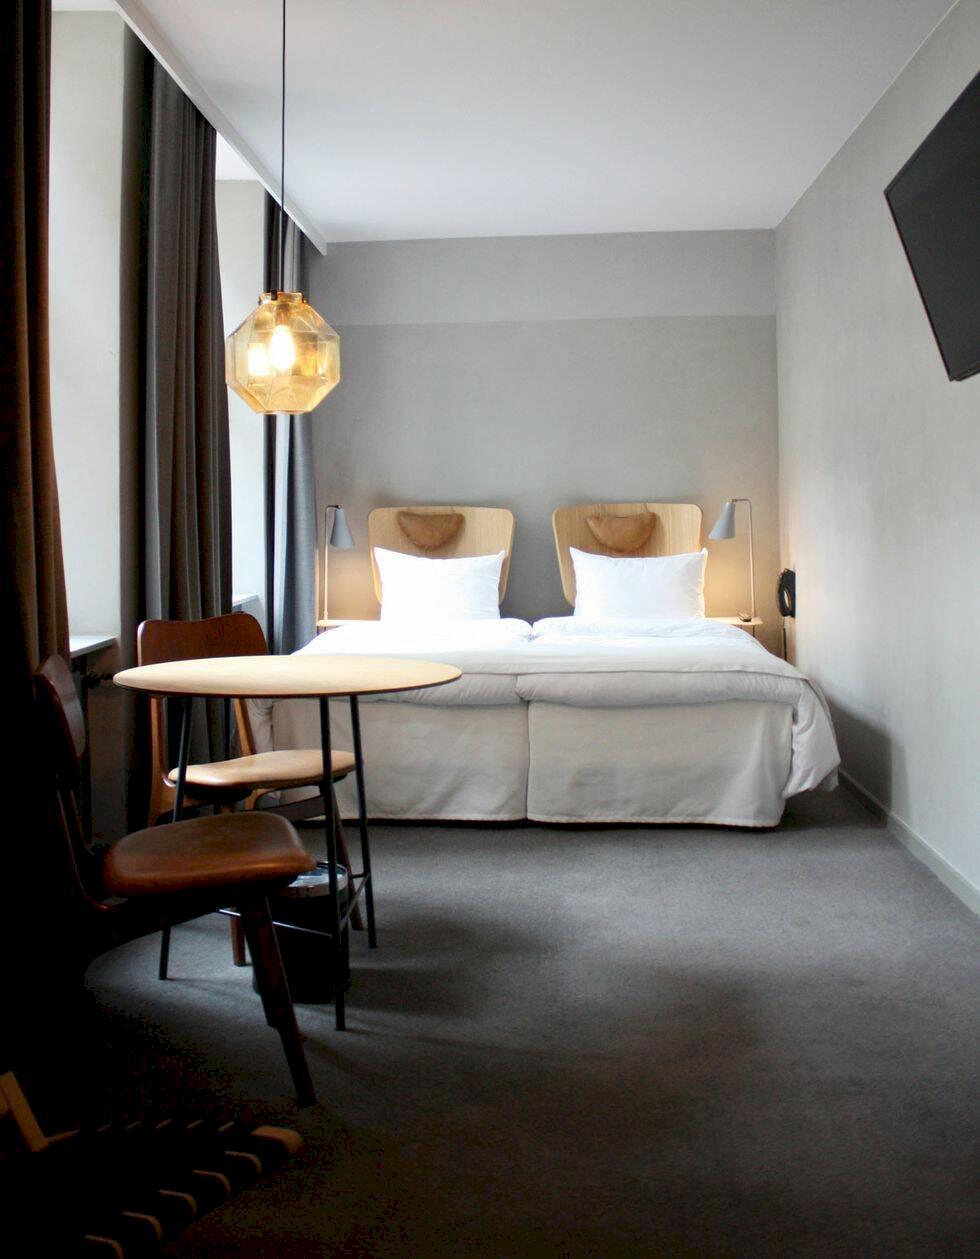 Köpenhamns hetaste hotell